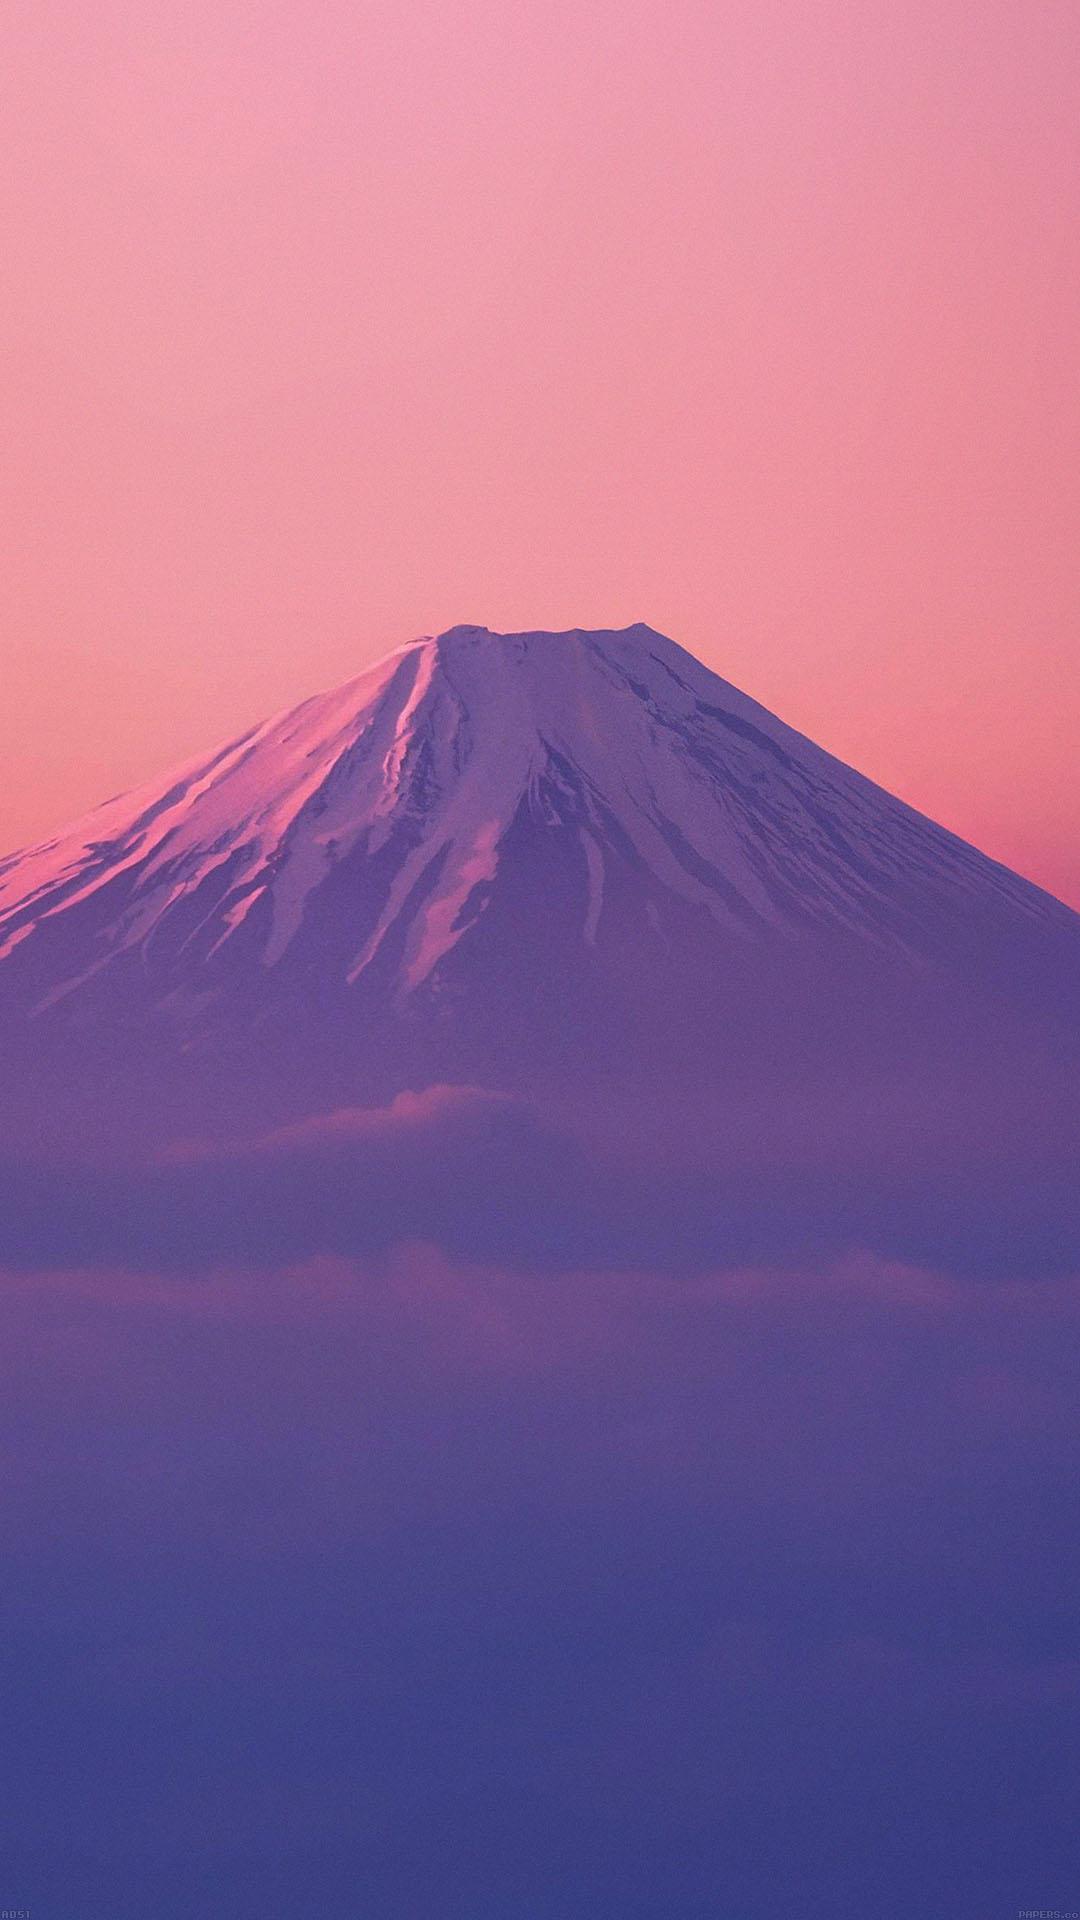 Cute Pink Wallpaper For Iphone 6 Ad51 Fuji Mountain Alone Wallpaper